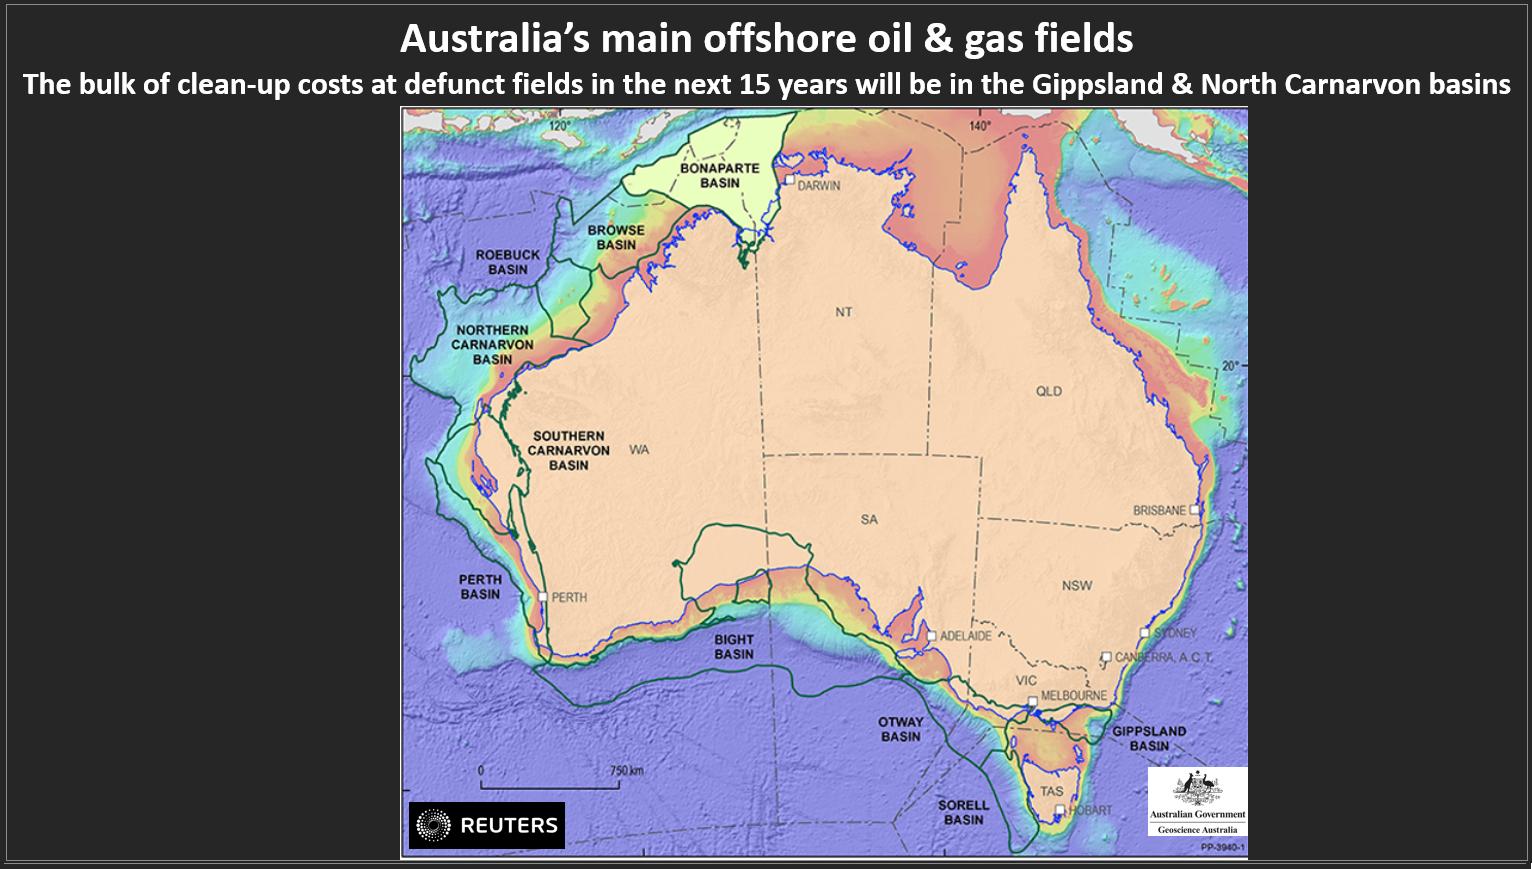 Australia's main oil & gas fields